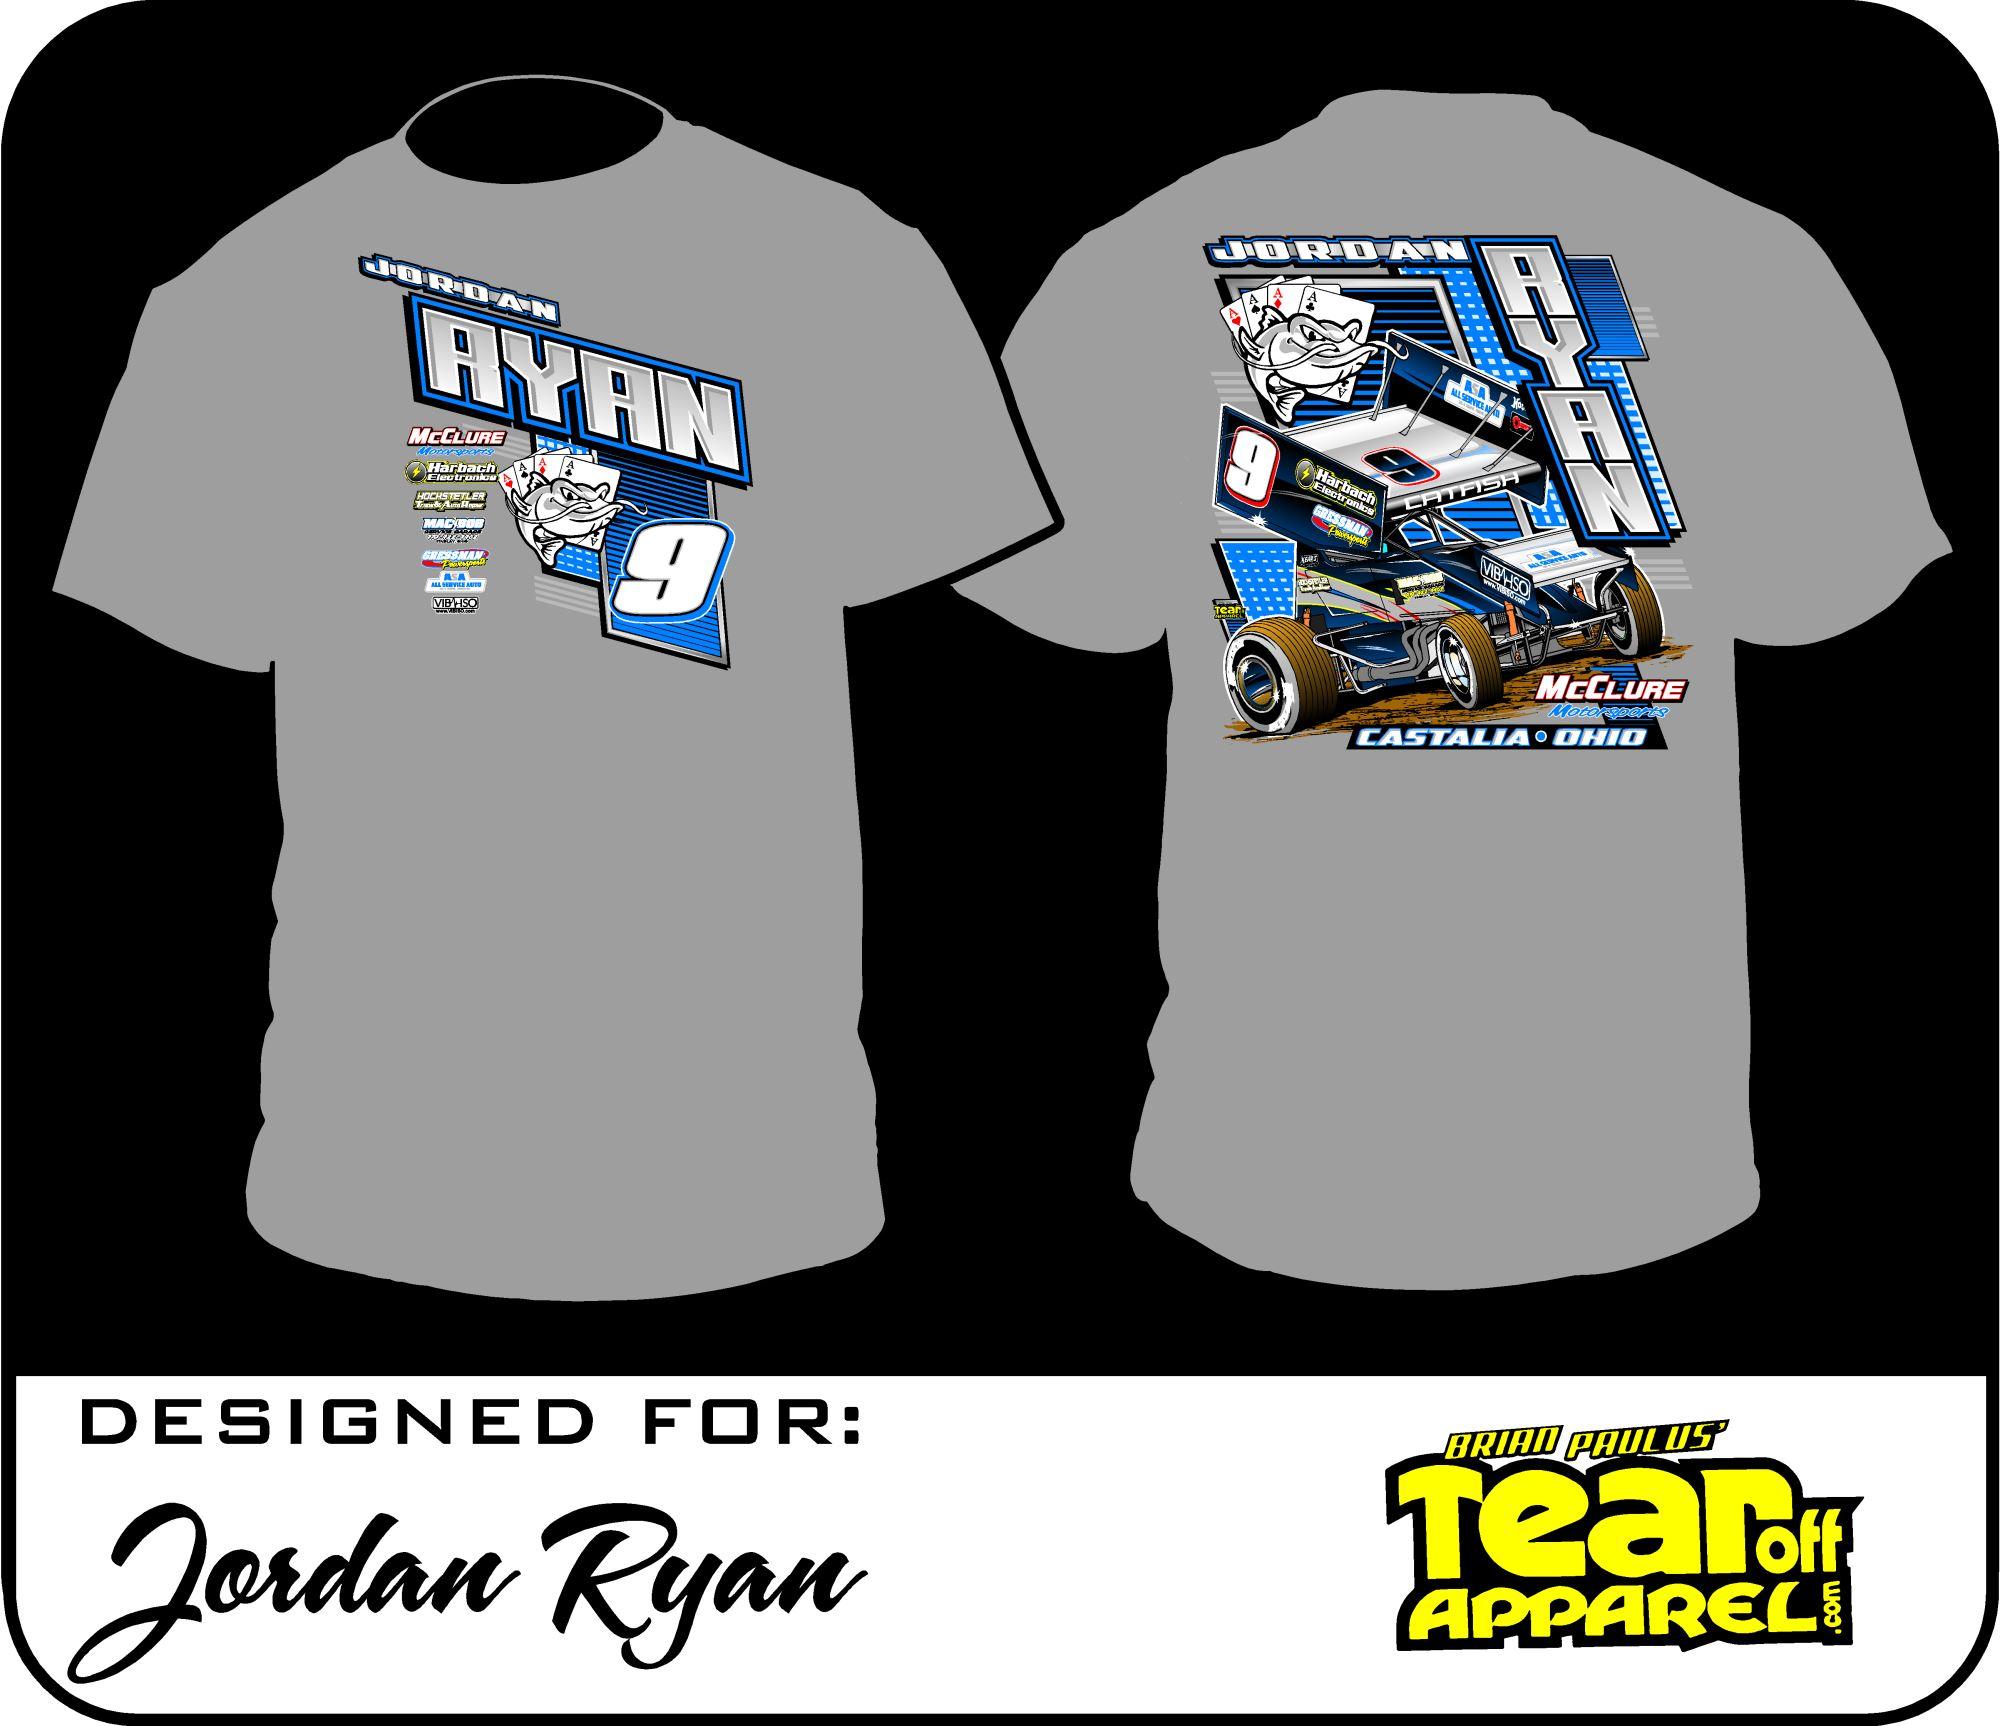 meilleur site web ac827 8c890 Jordan Ryan Racing T-Shirt